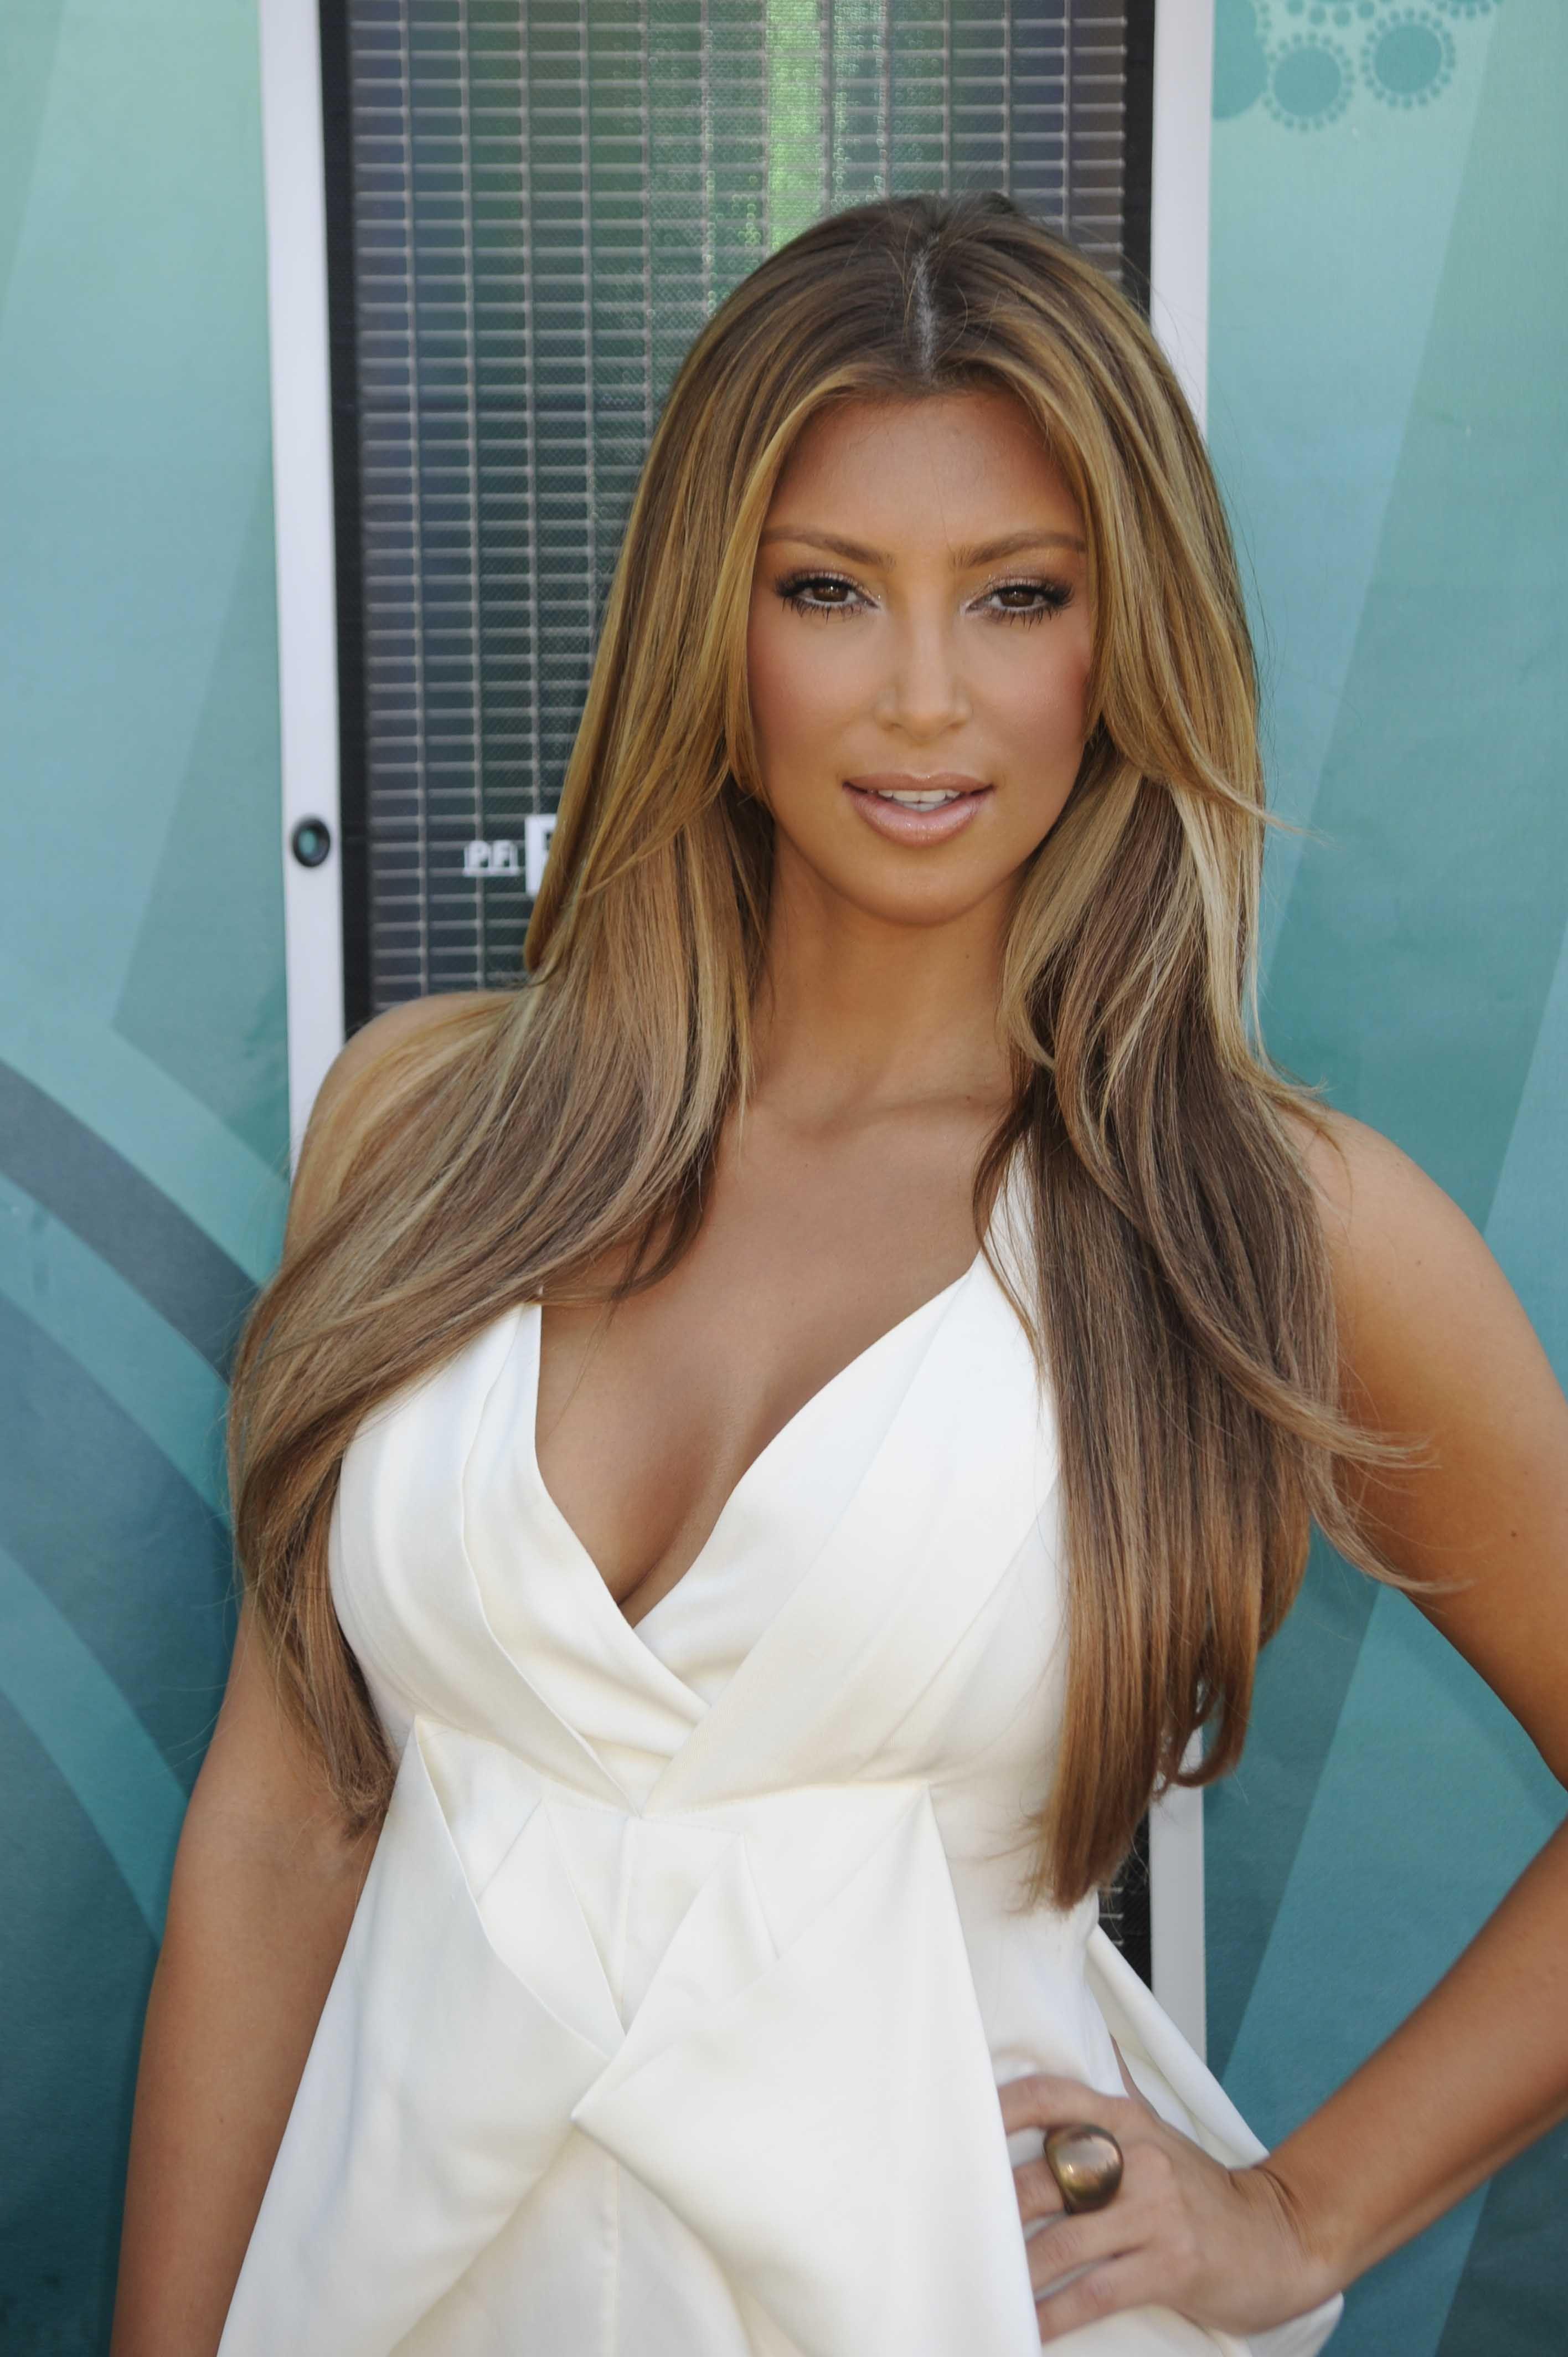 kim kardashian starting to go blonde - Google Search